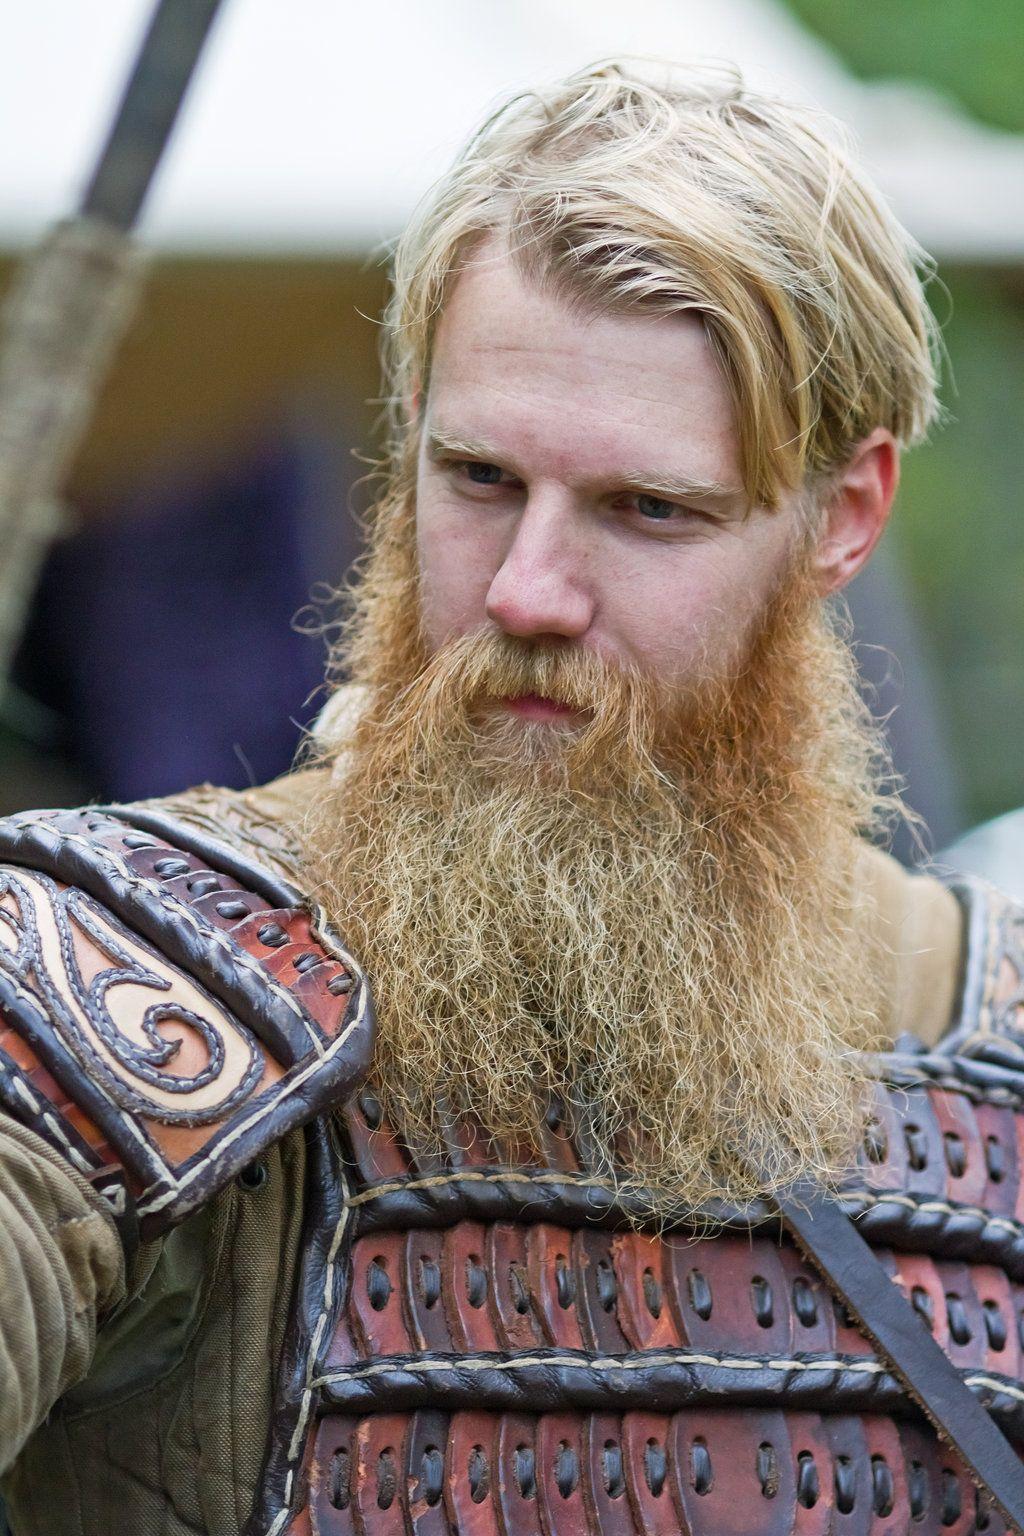 Blonde Viking Beard